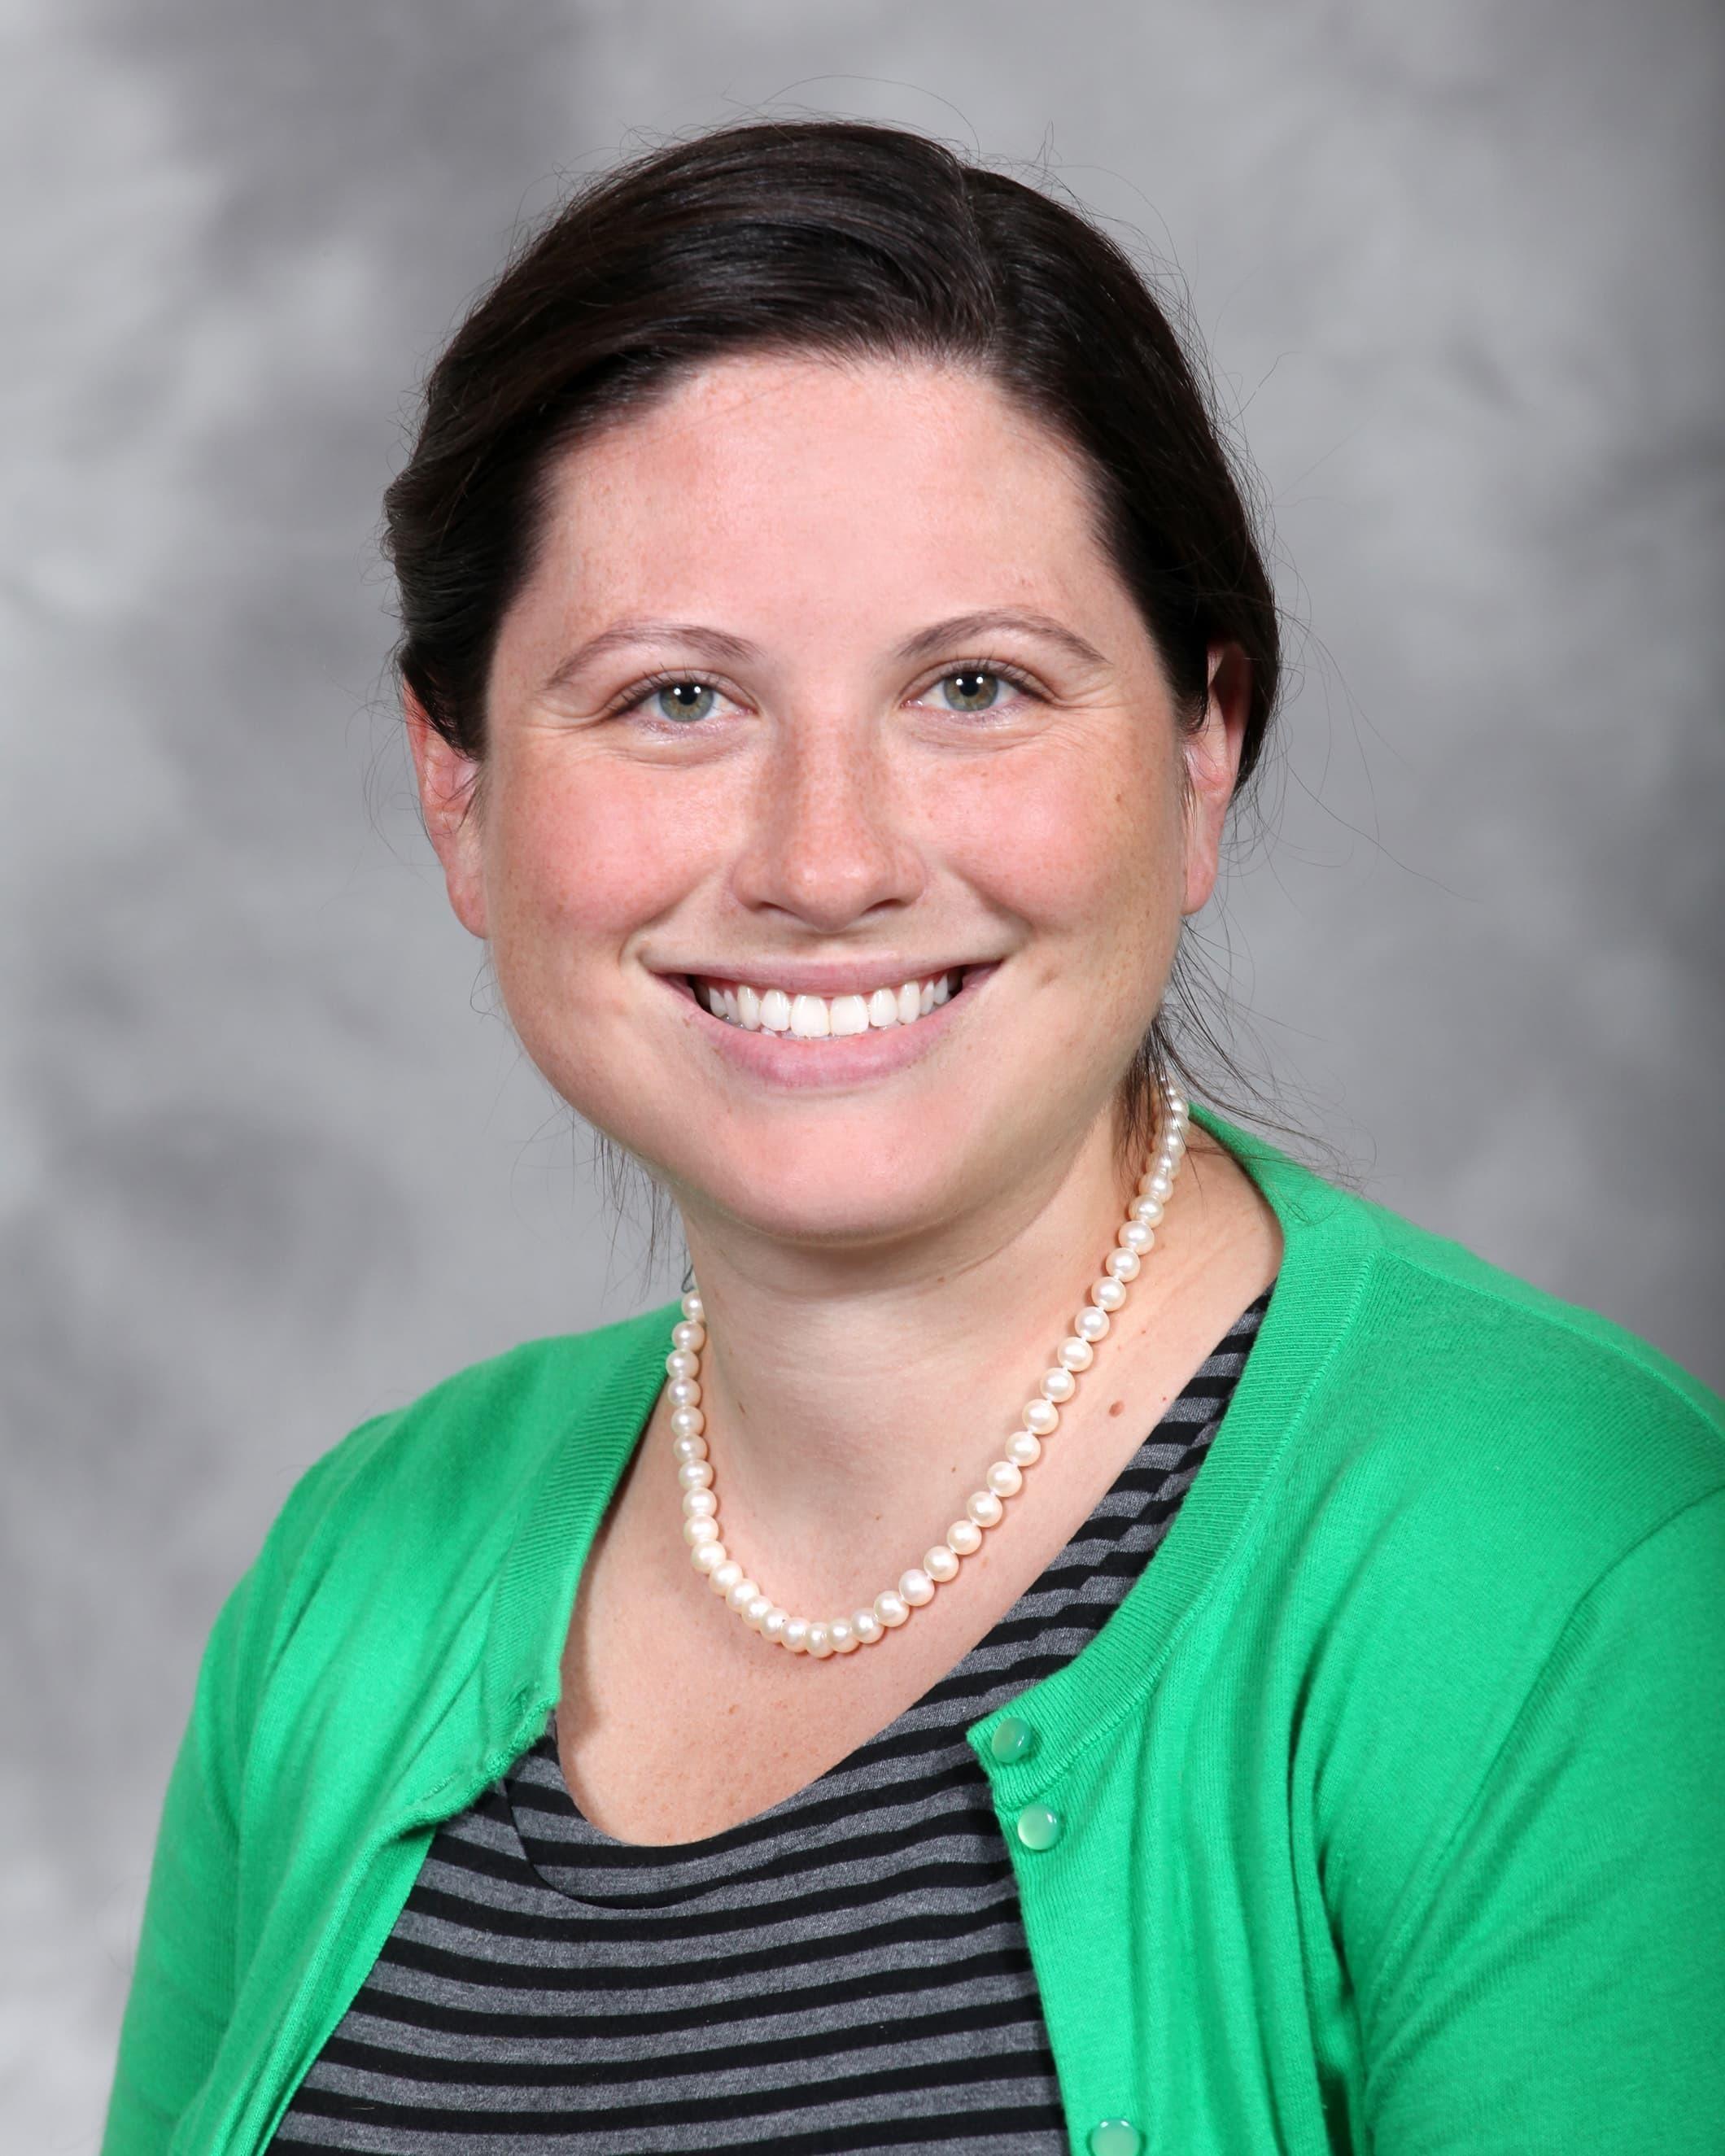 Danielle N Wiese, MD